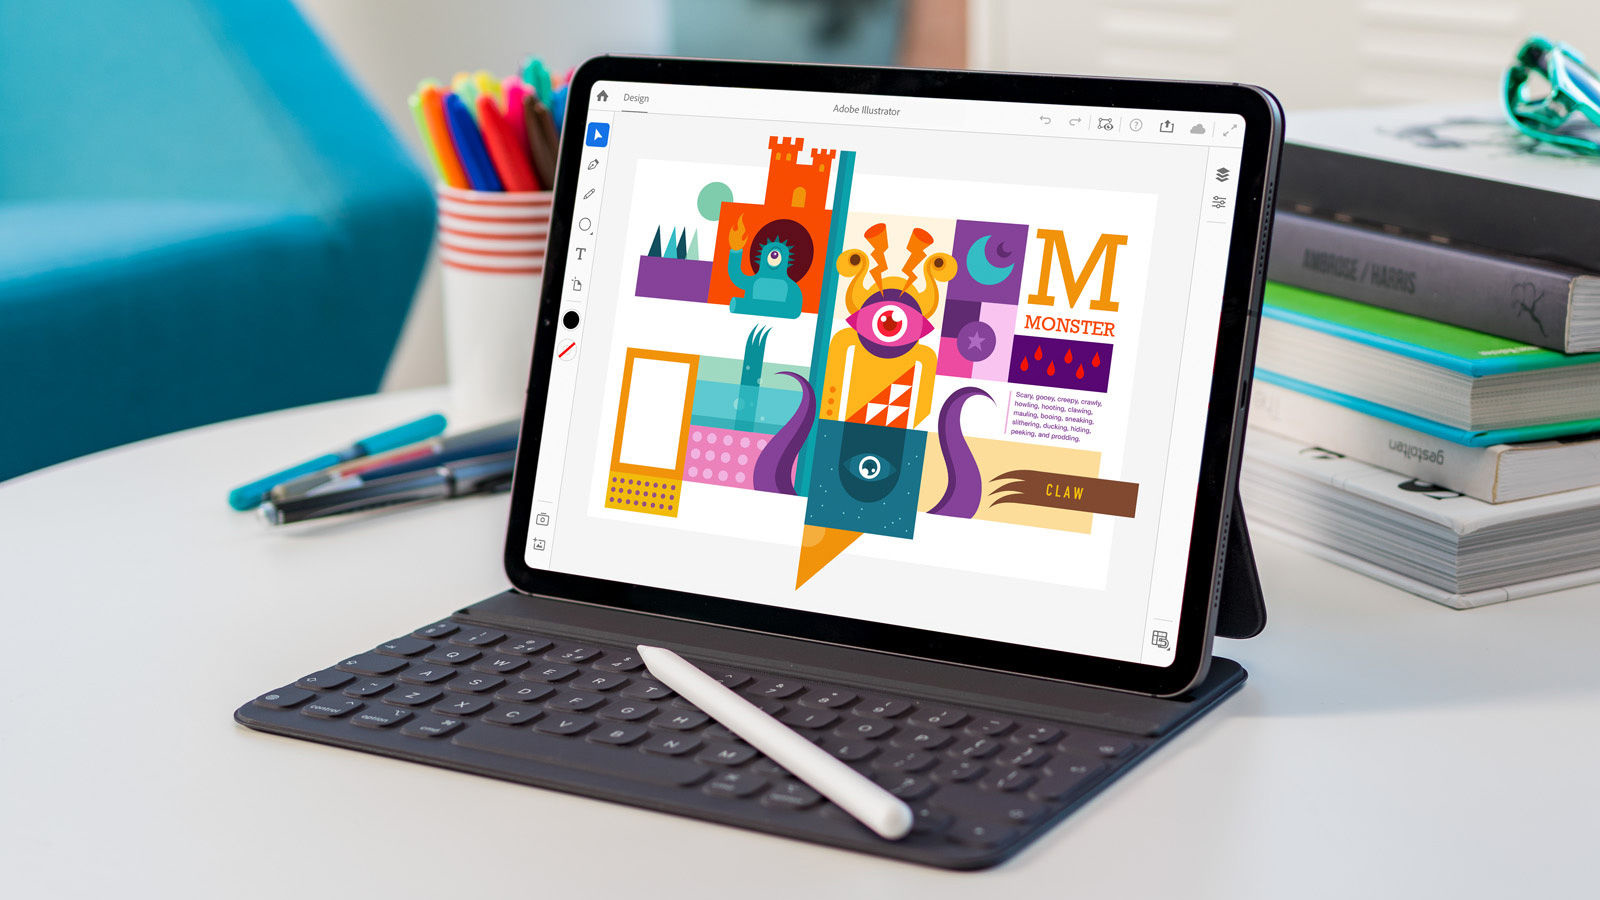 Adobe Illustrator for the iPad